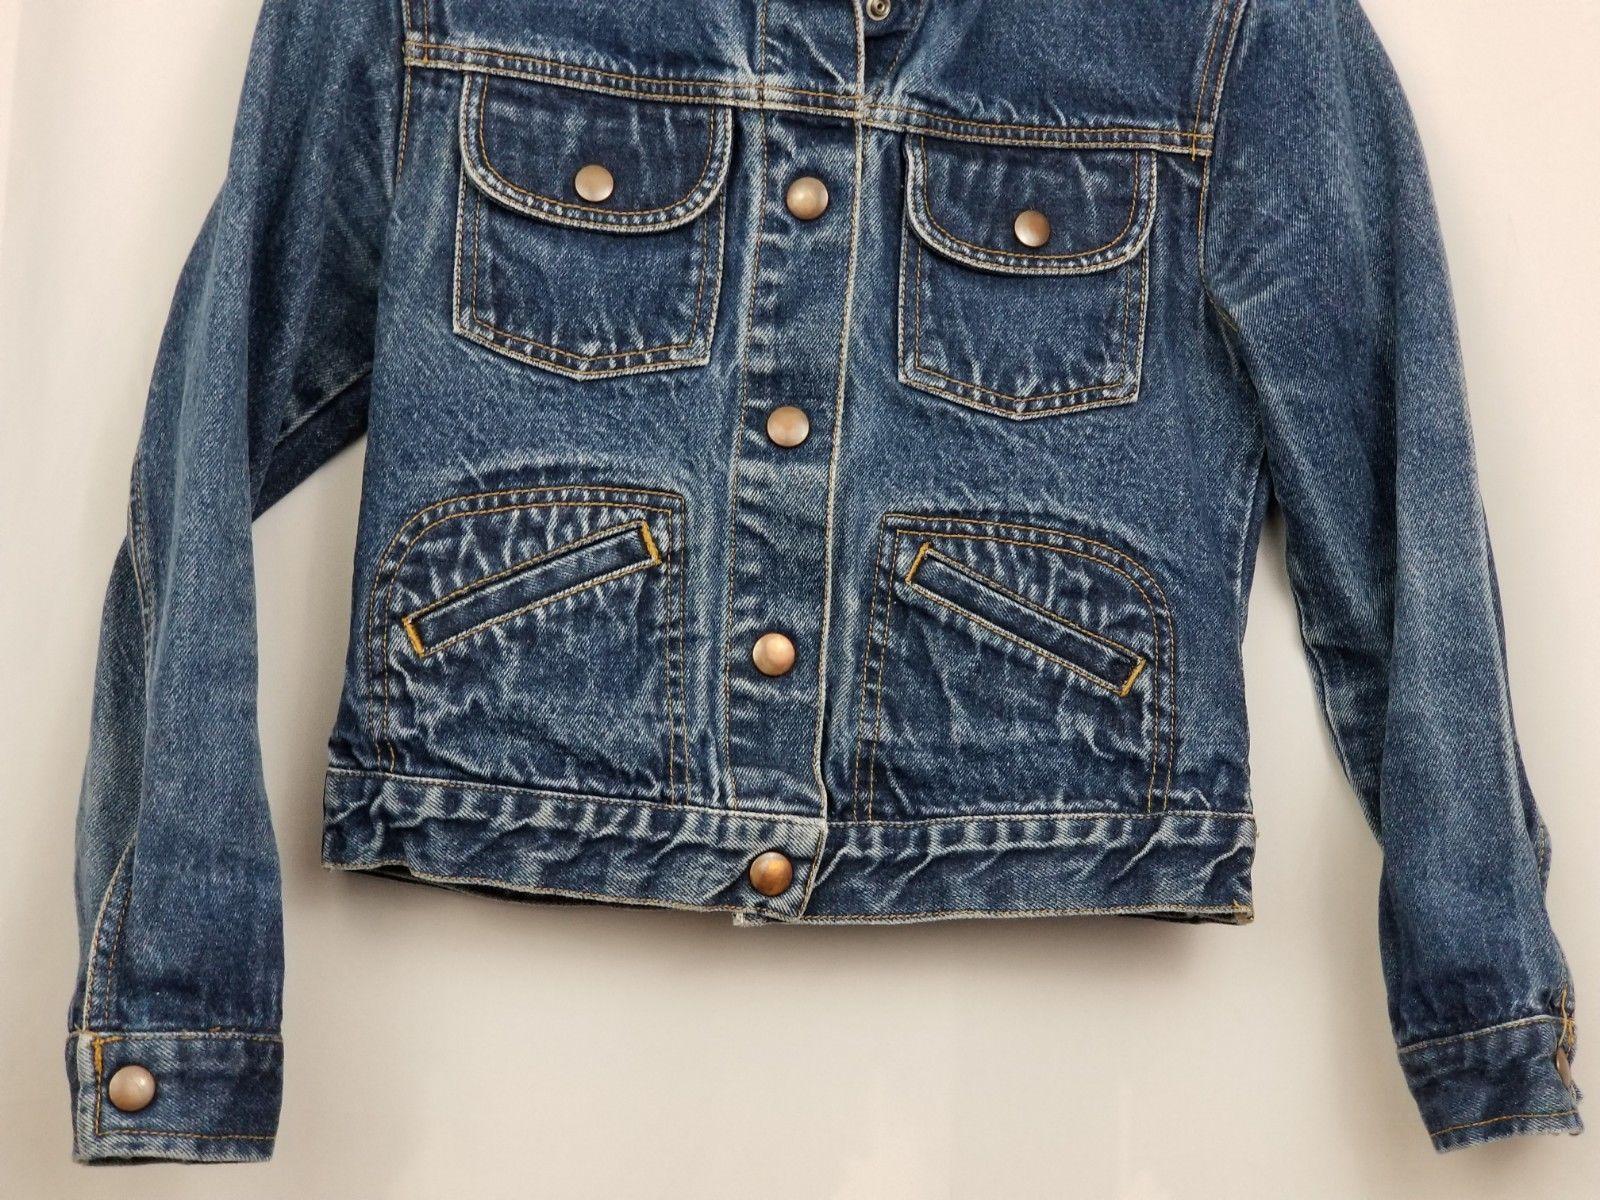 GAP Kids Denim Jean Jacket Coat Long Sleeve Blue Pockets Large Factory Store image 4